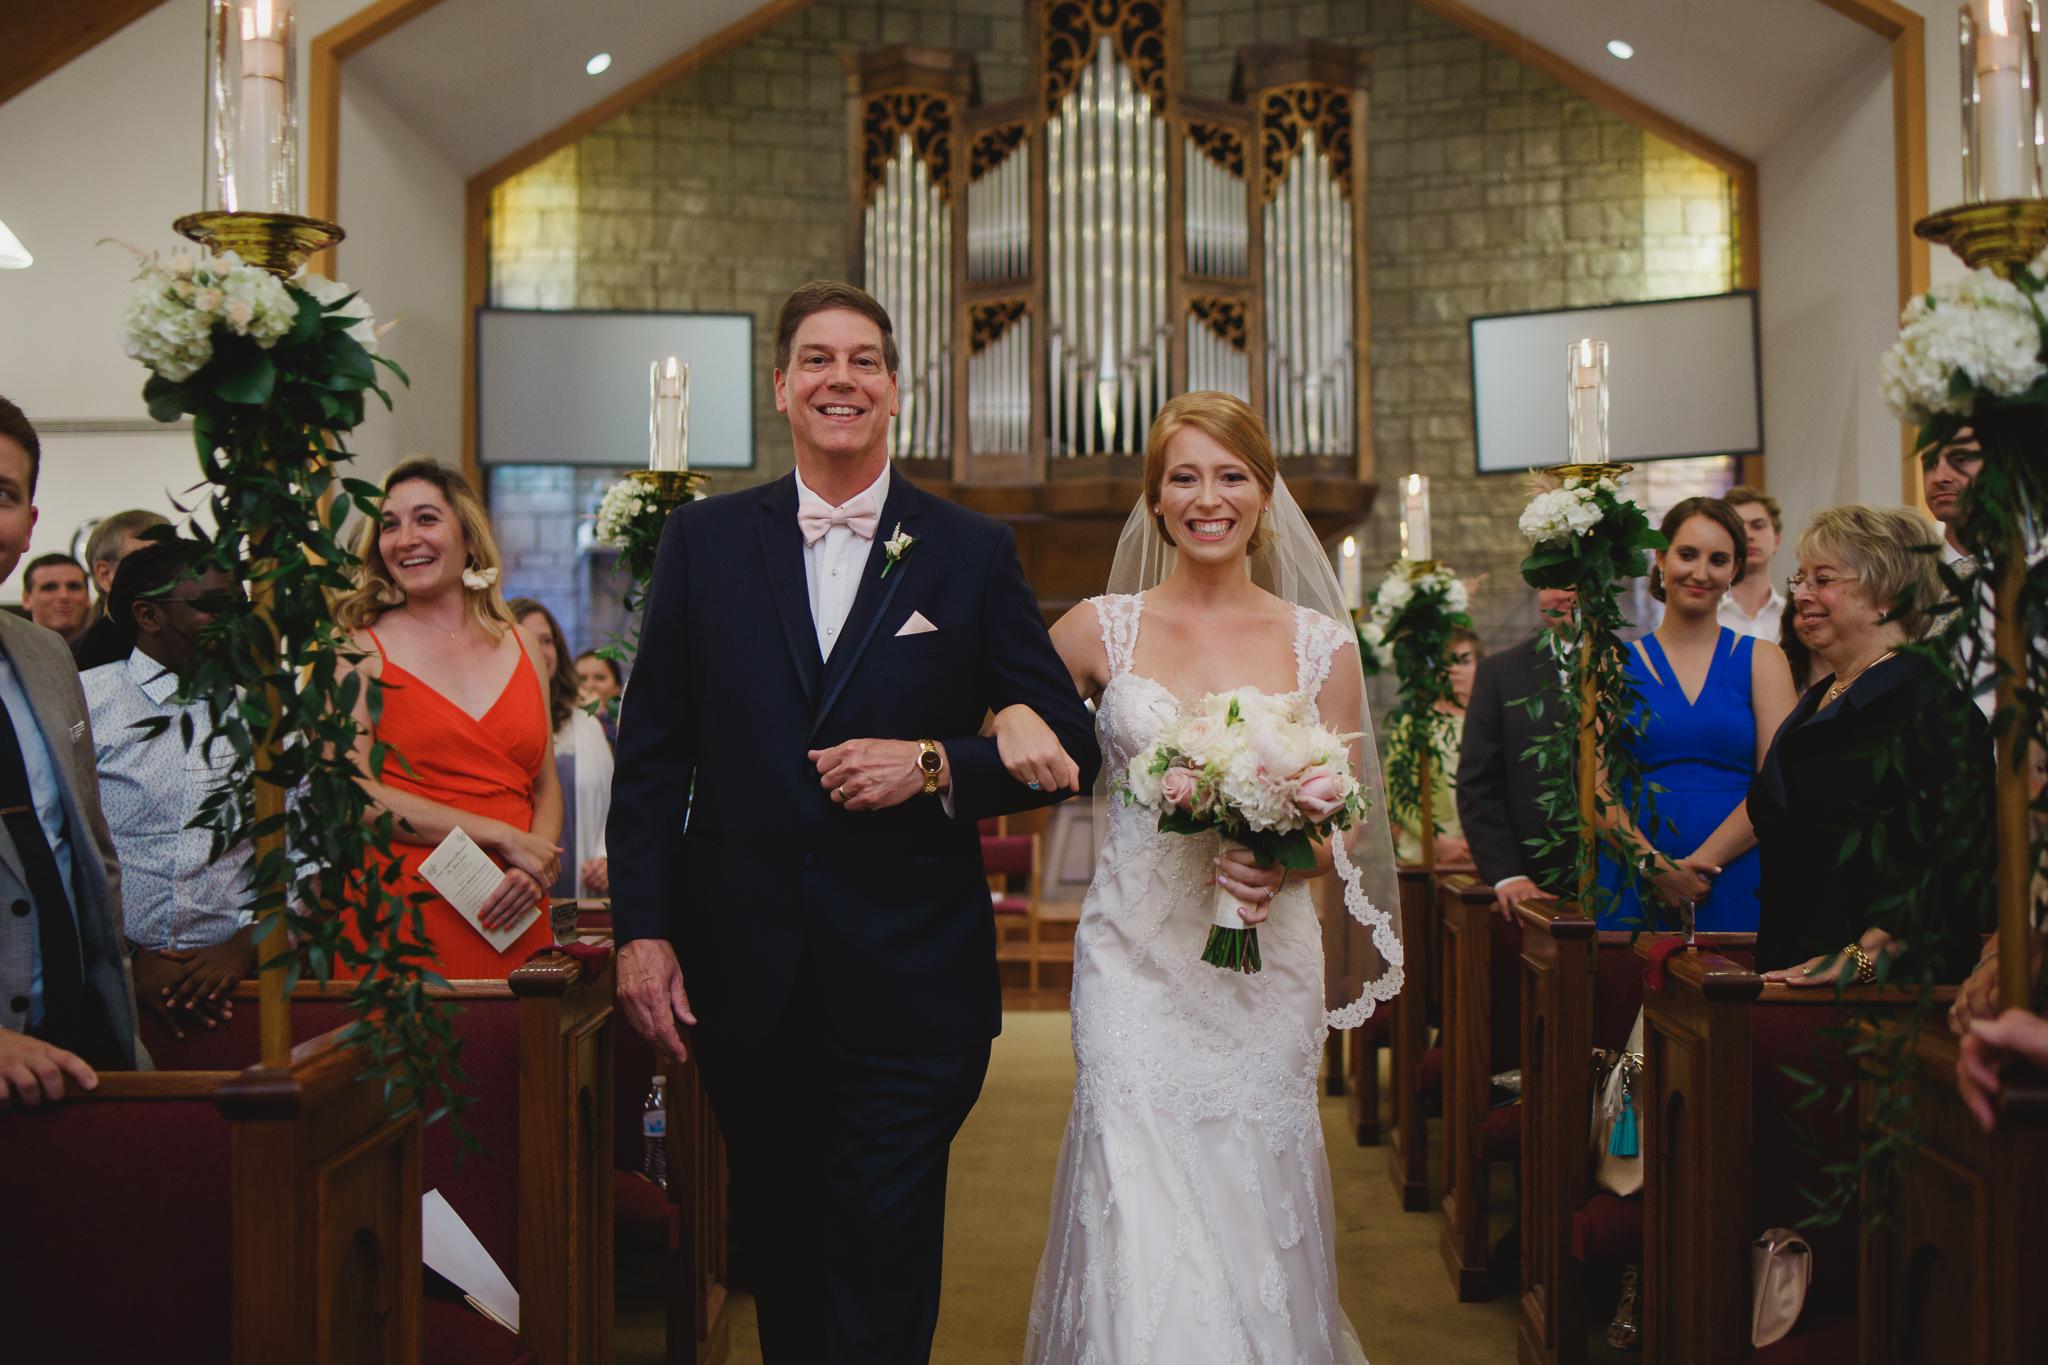 Michael and Kelly - the ashton depot - wedding DFW - wedding photographer- elizalde photography (32 of 150).jpg